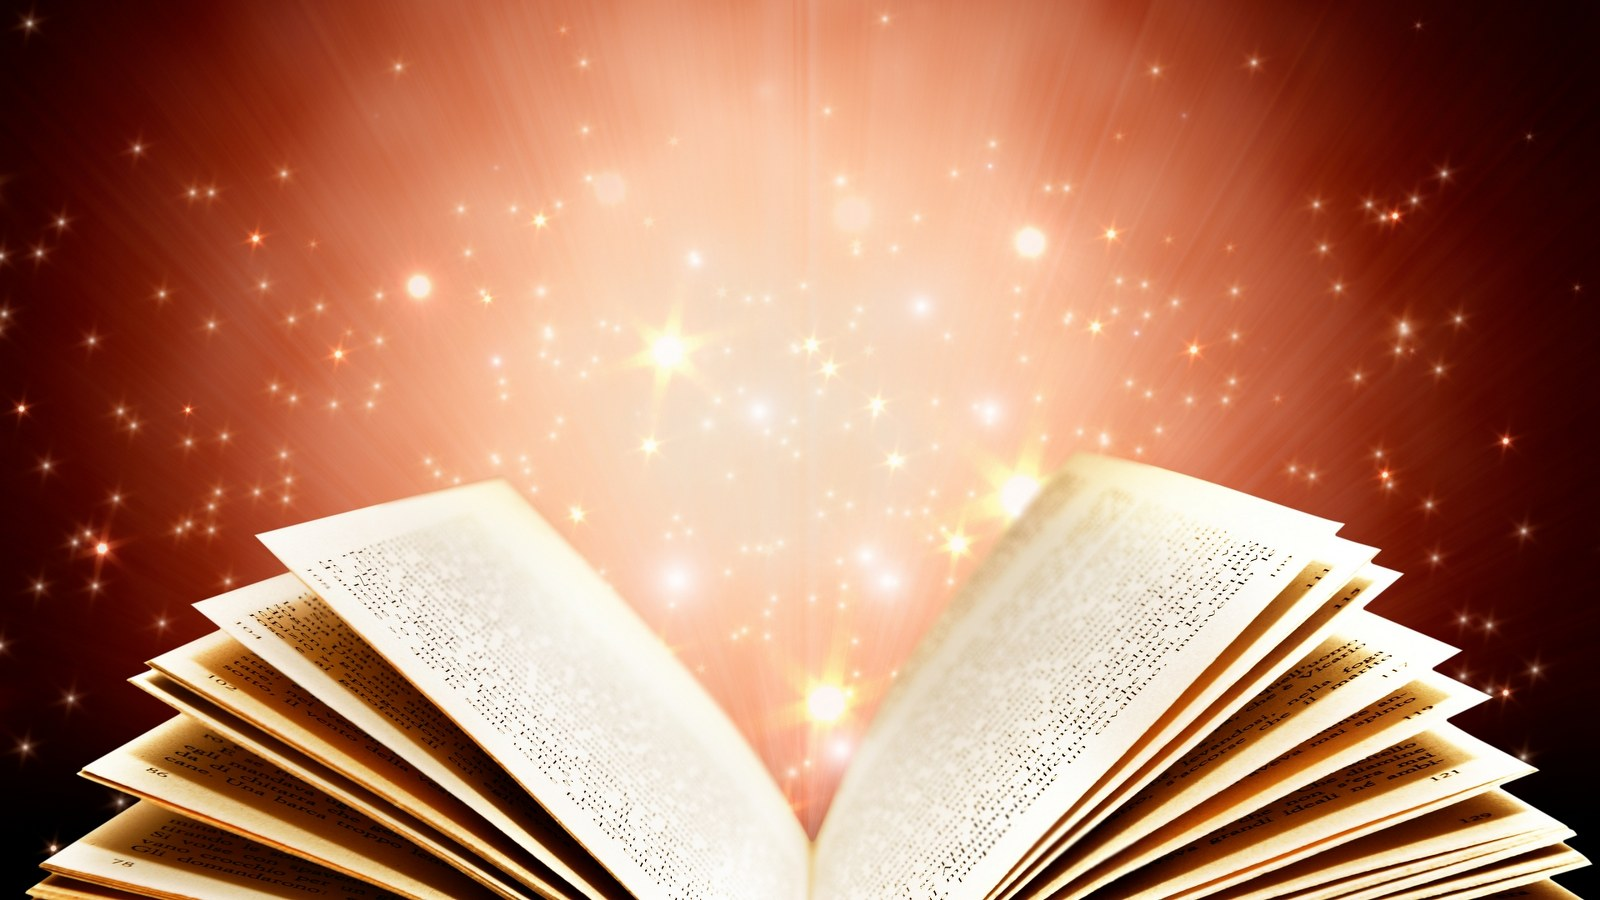 47+] Bible Wallpaper HD on WallpaperSafari